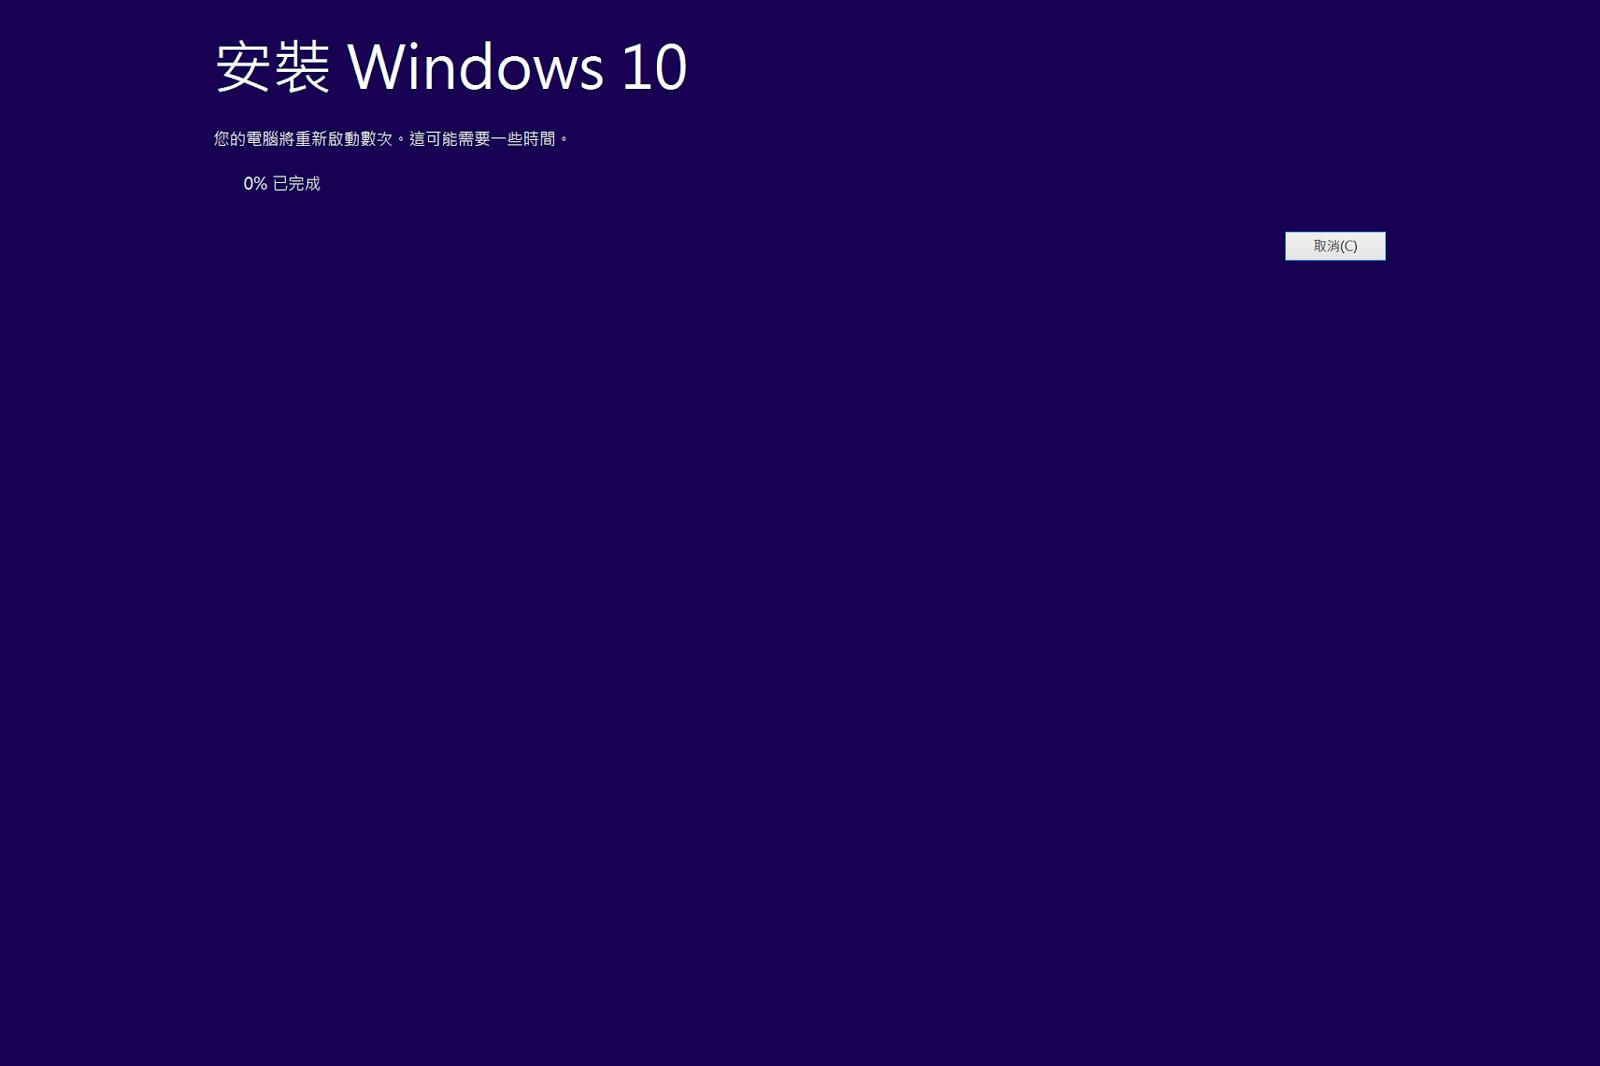 Image%2B008 - [實測] Win7/Win8/Win8.1免費升級至Win10,超簡單免用USB、光碟機!